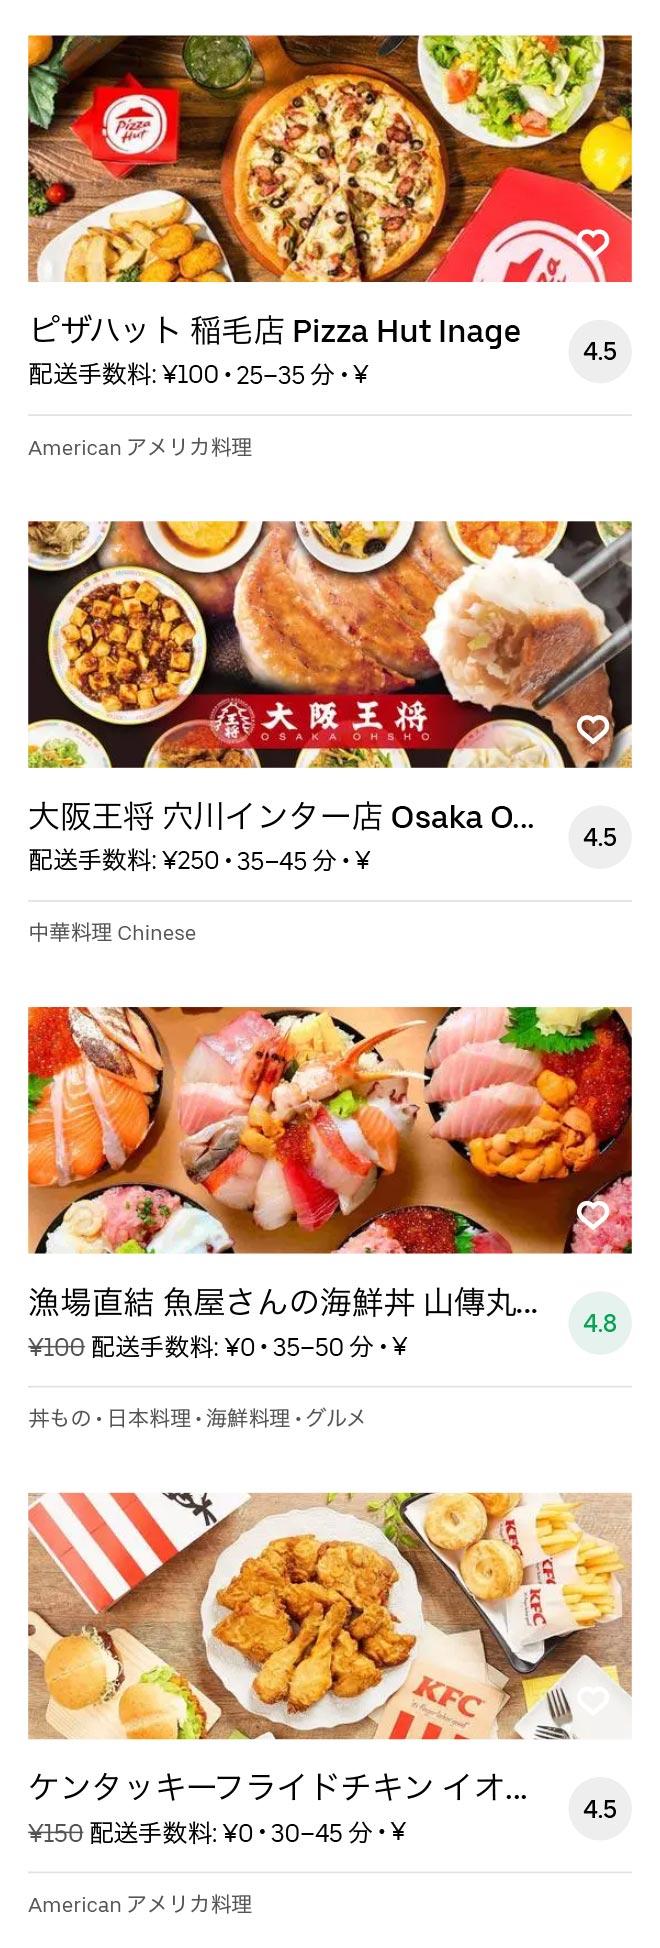 Inage menu 2010 09